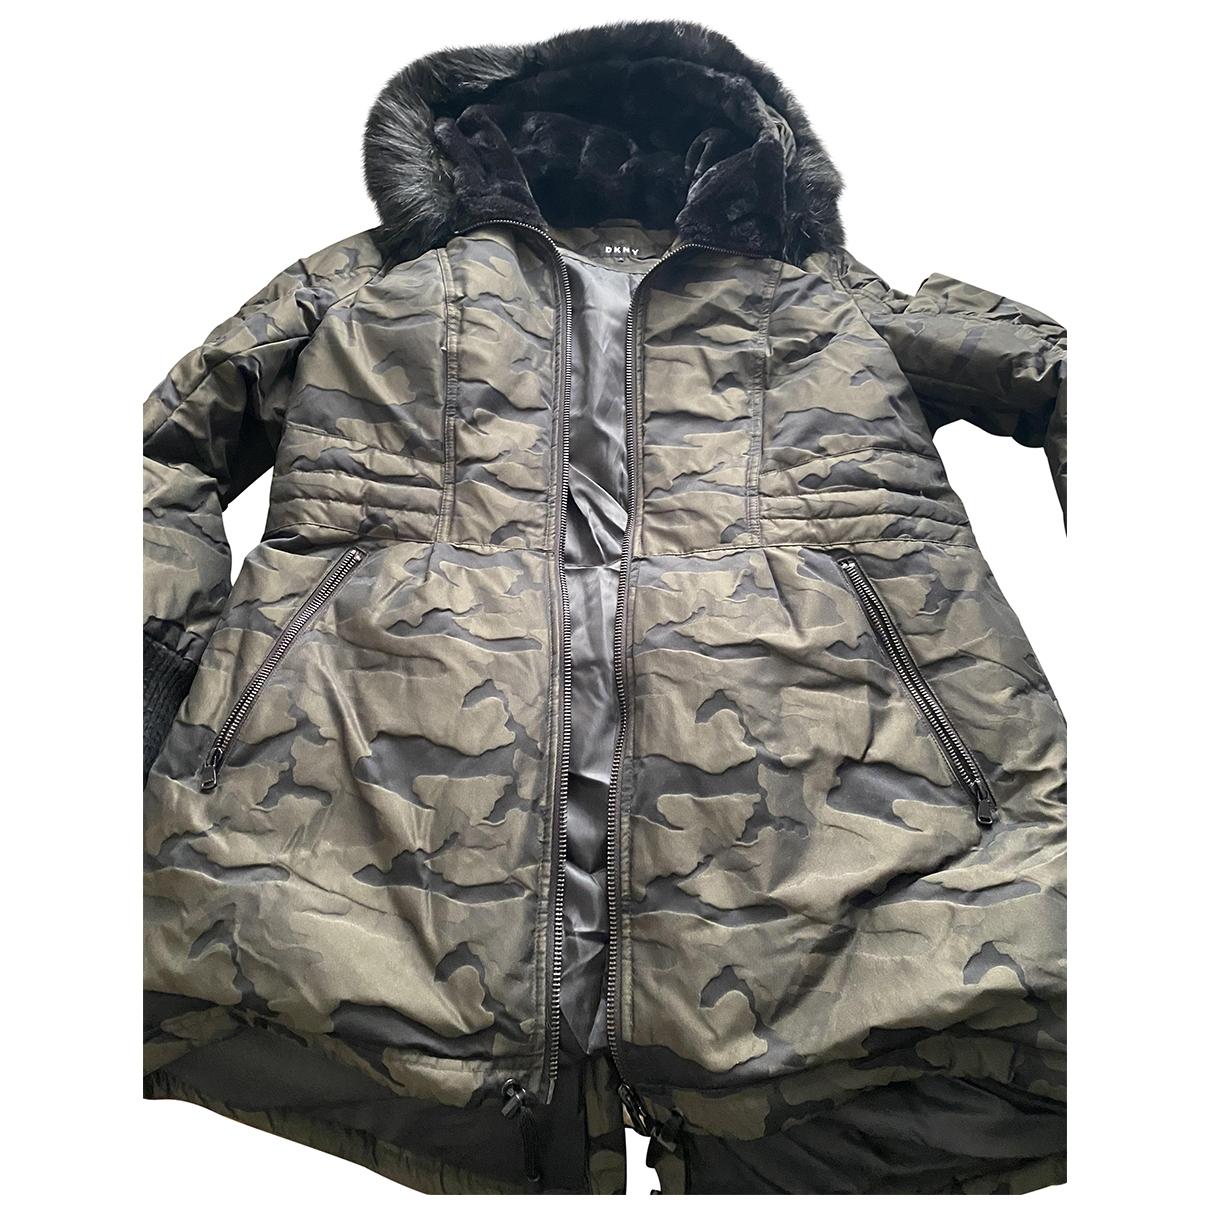 Dkny \N Khaki coat for Women XL International